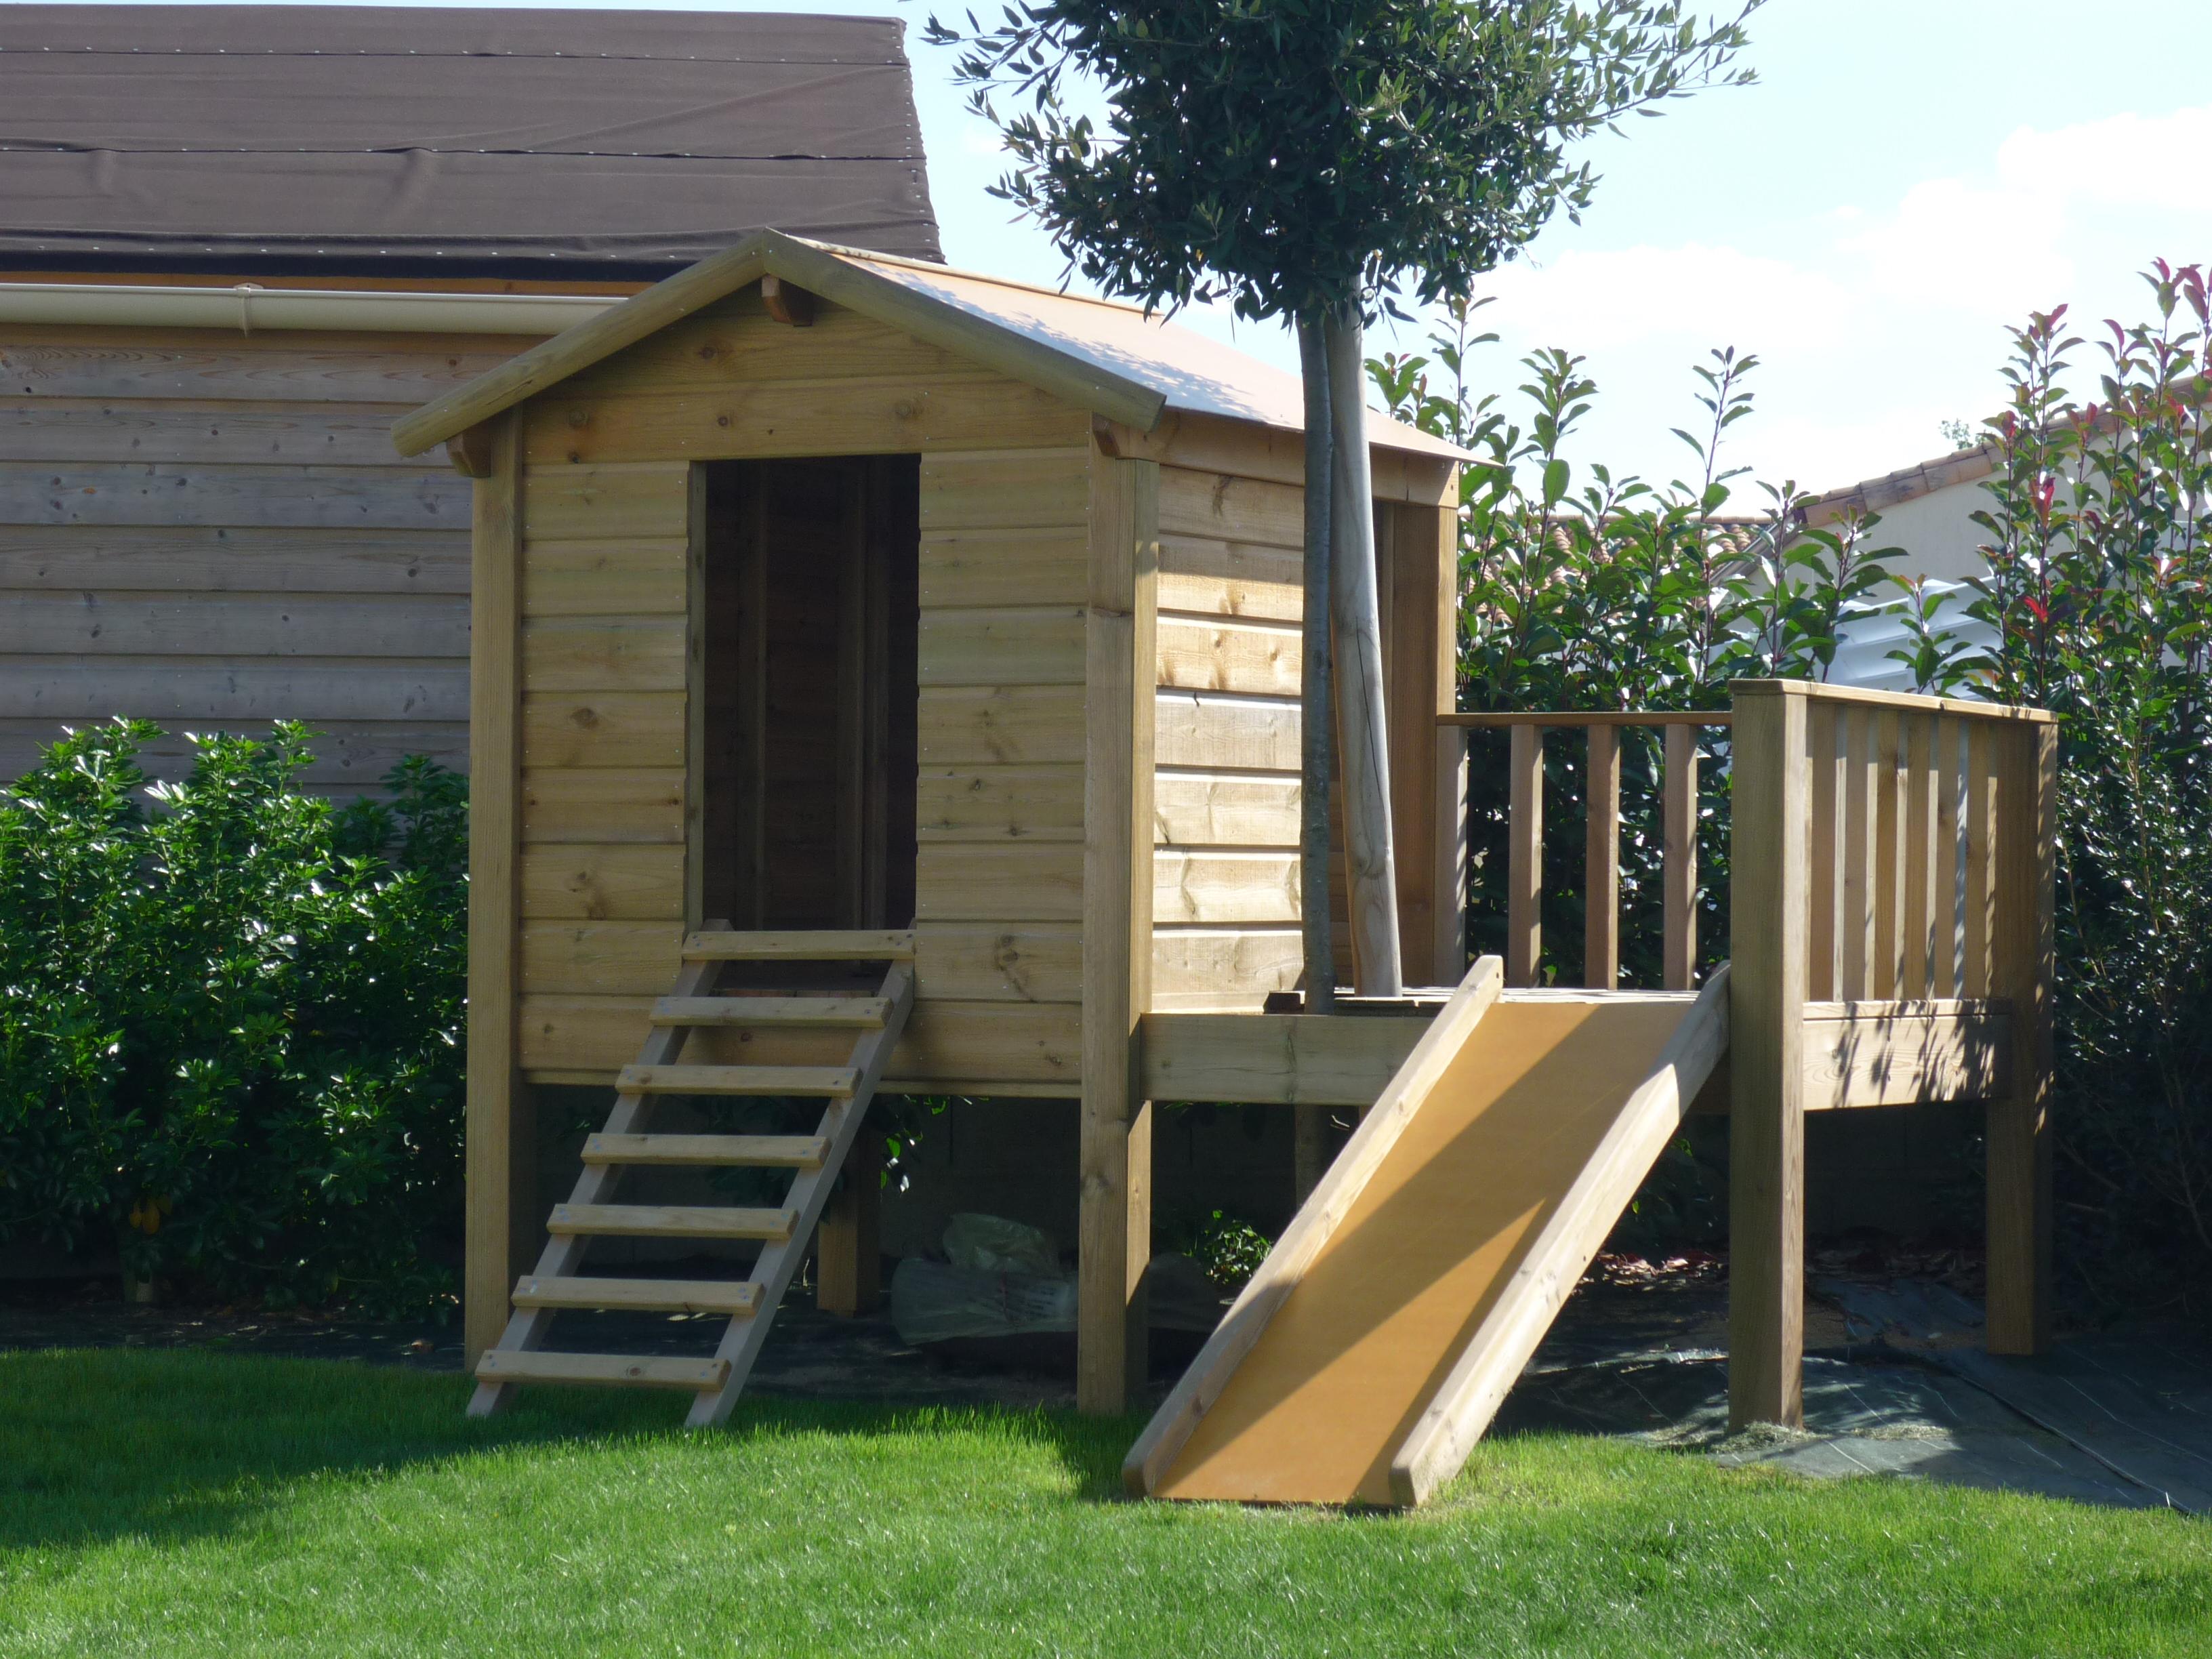 cabane jardin brico depot abri de jardin et balancoire id e. Black Bedroom Furniture Sets. Home Design Ideas